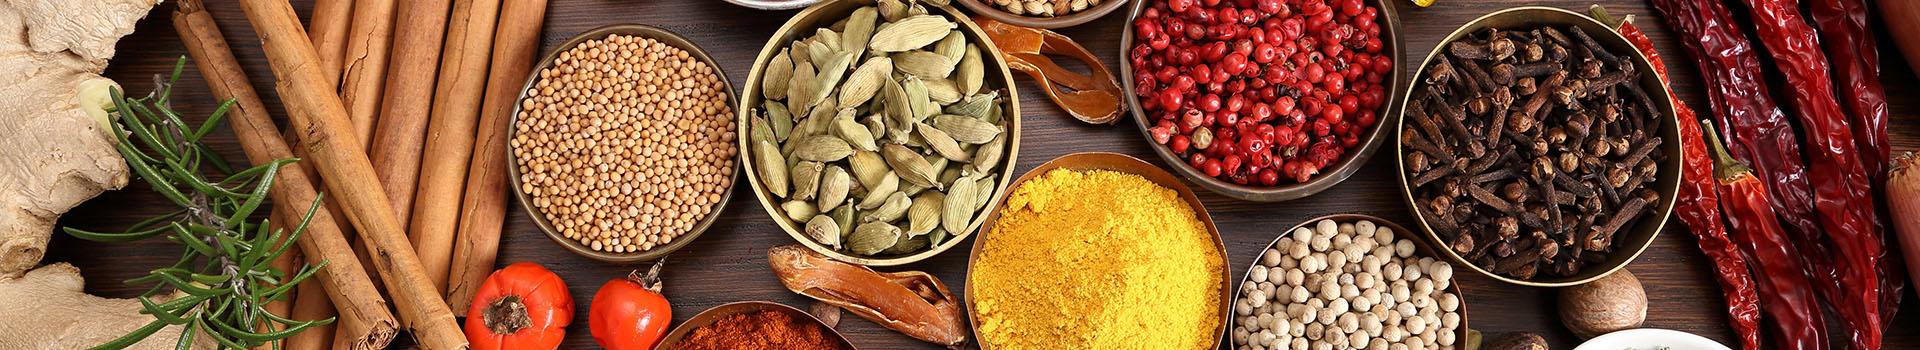 About-Tasty-Bowl-Savory-Seasonings